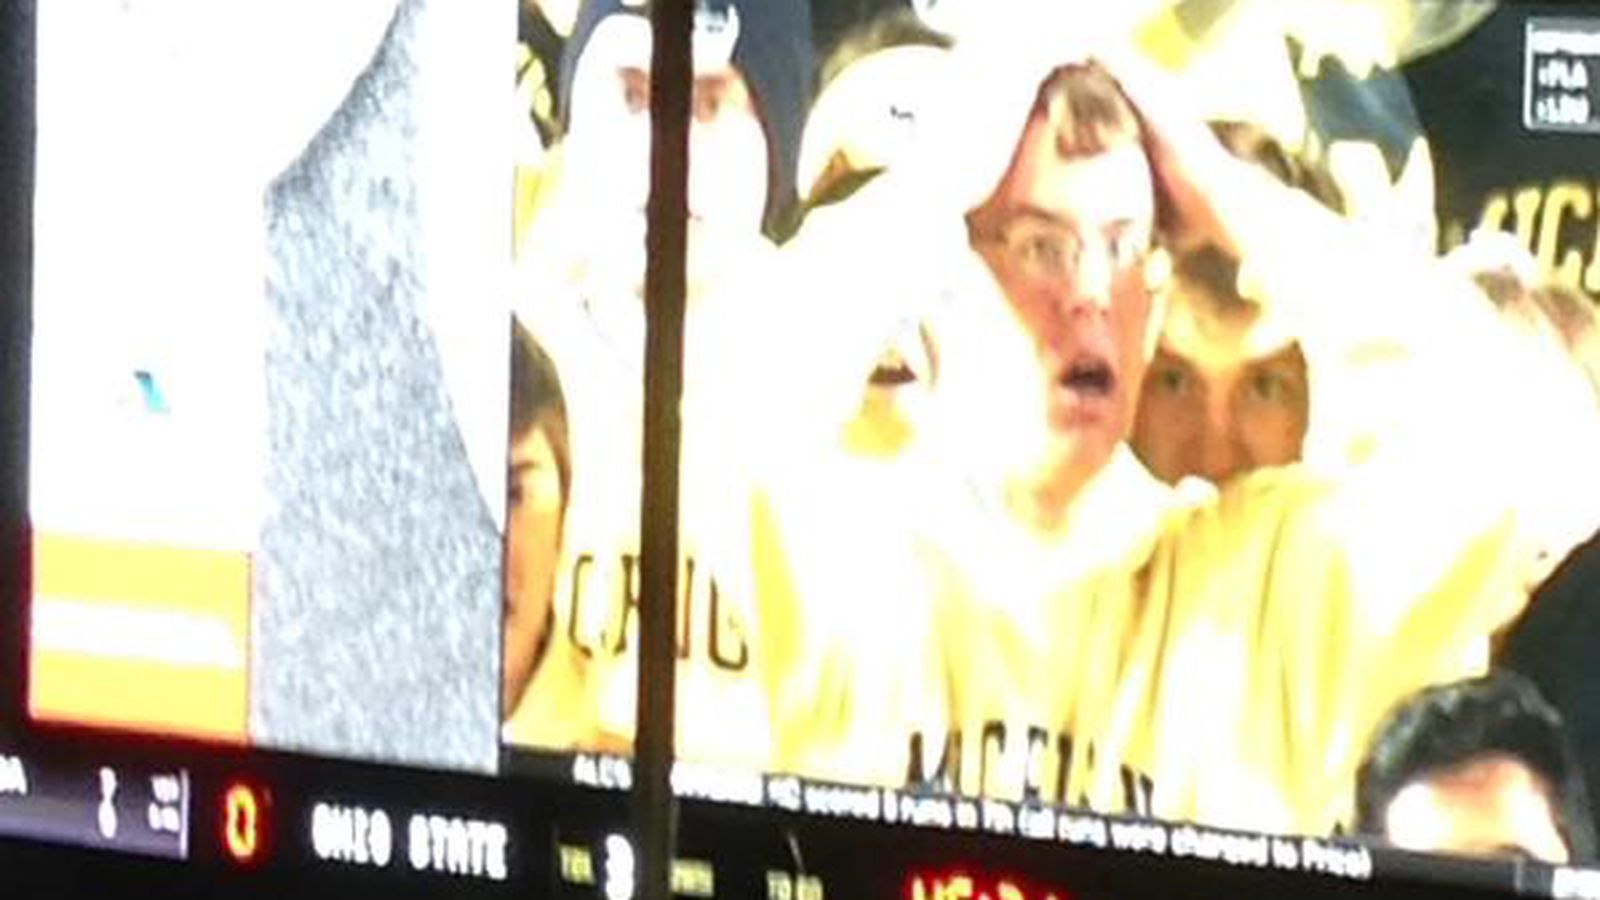 Ohio State paused its video board on the sad Michigan fan